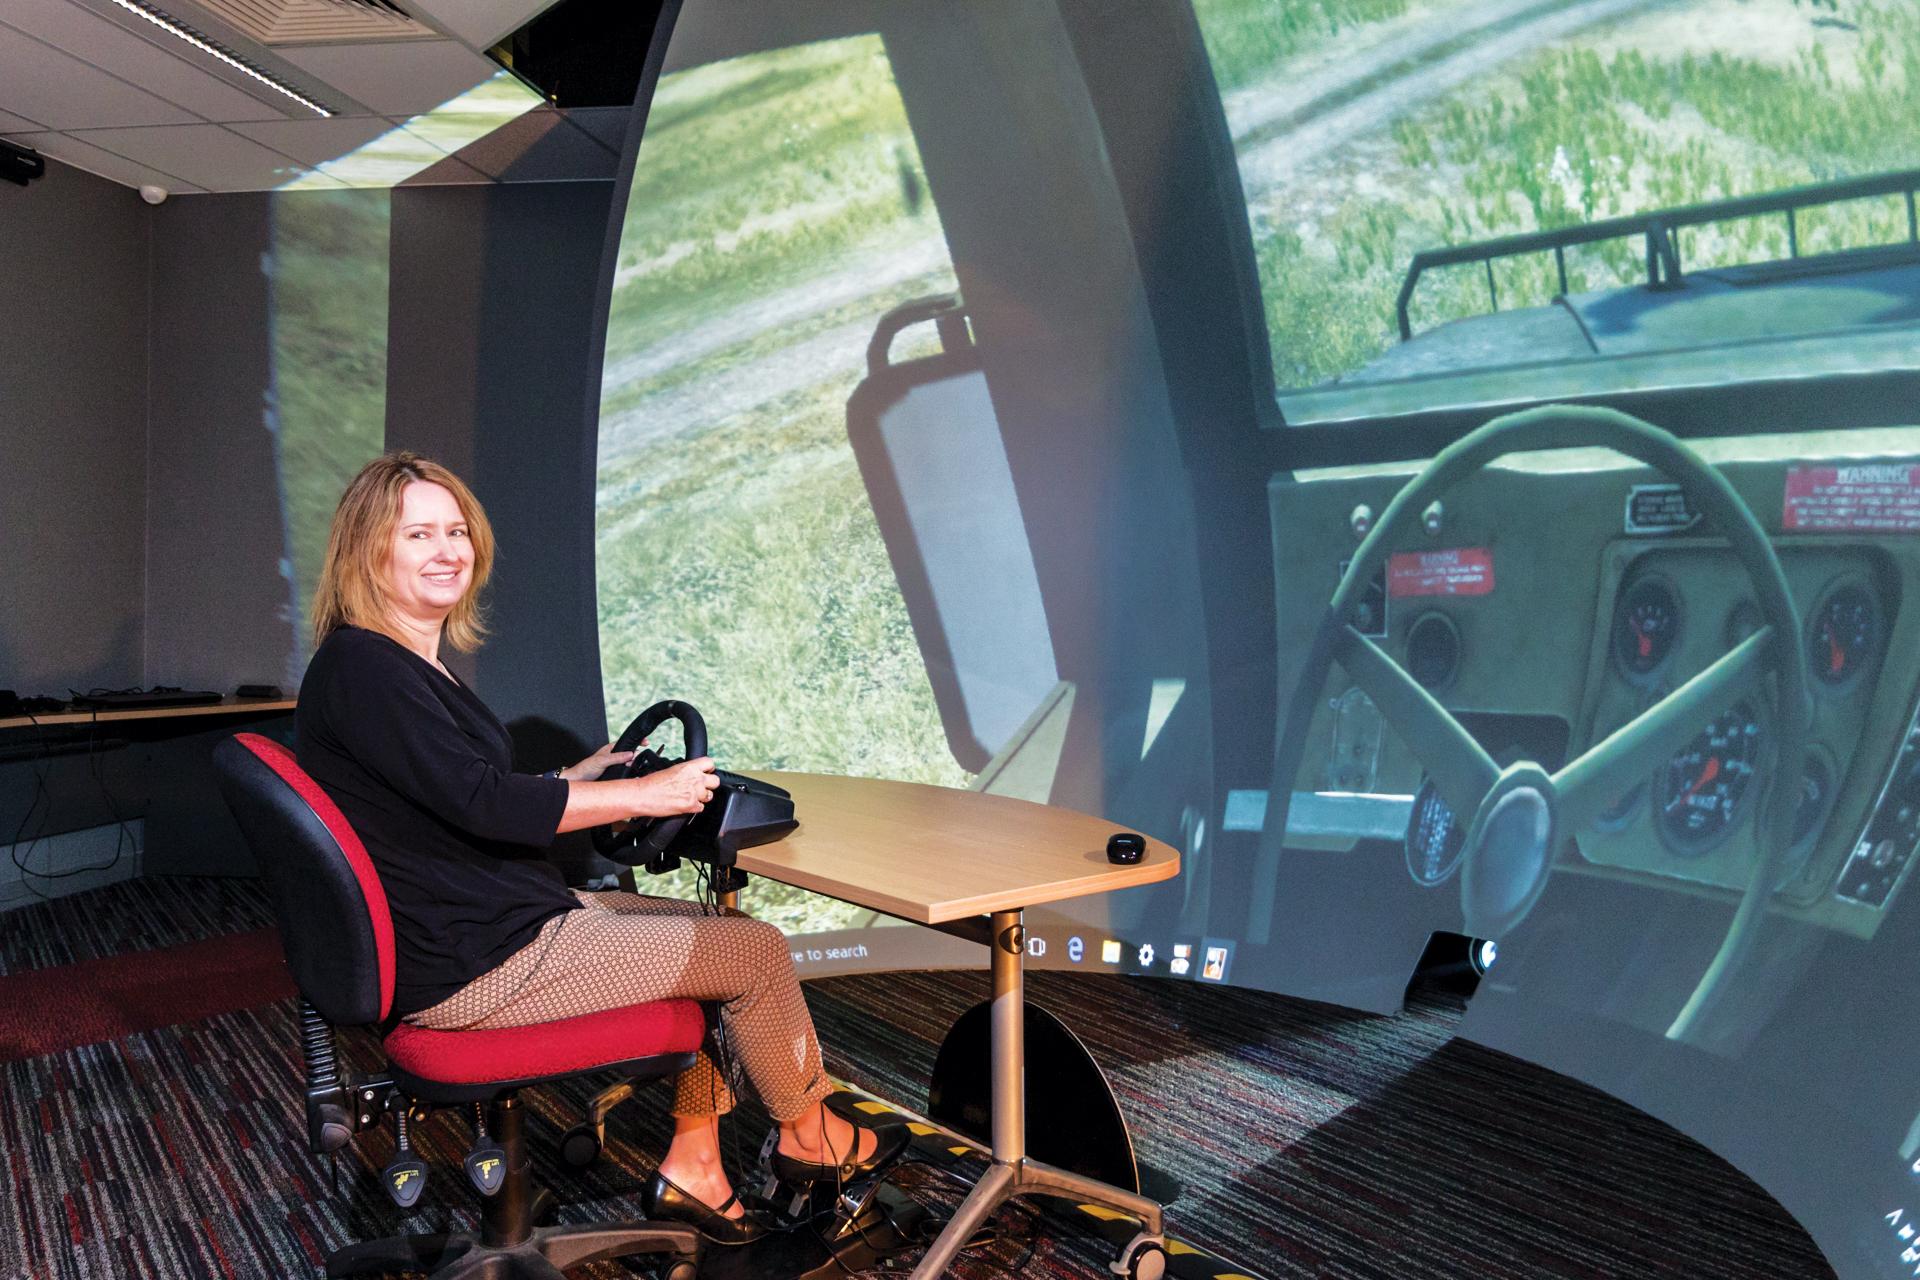 Defence Force VR training